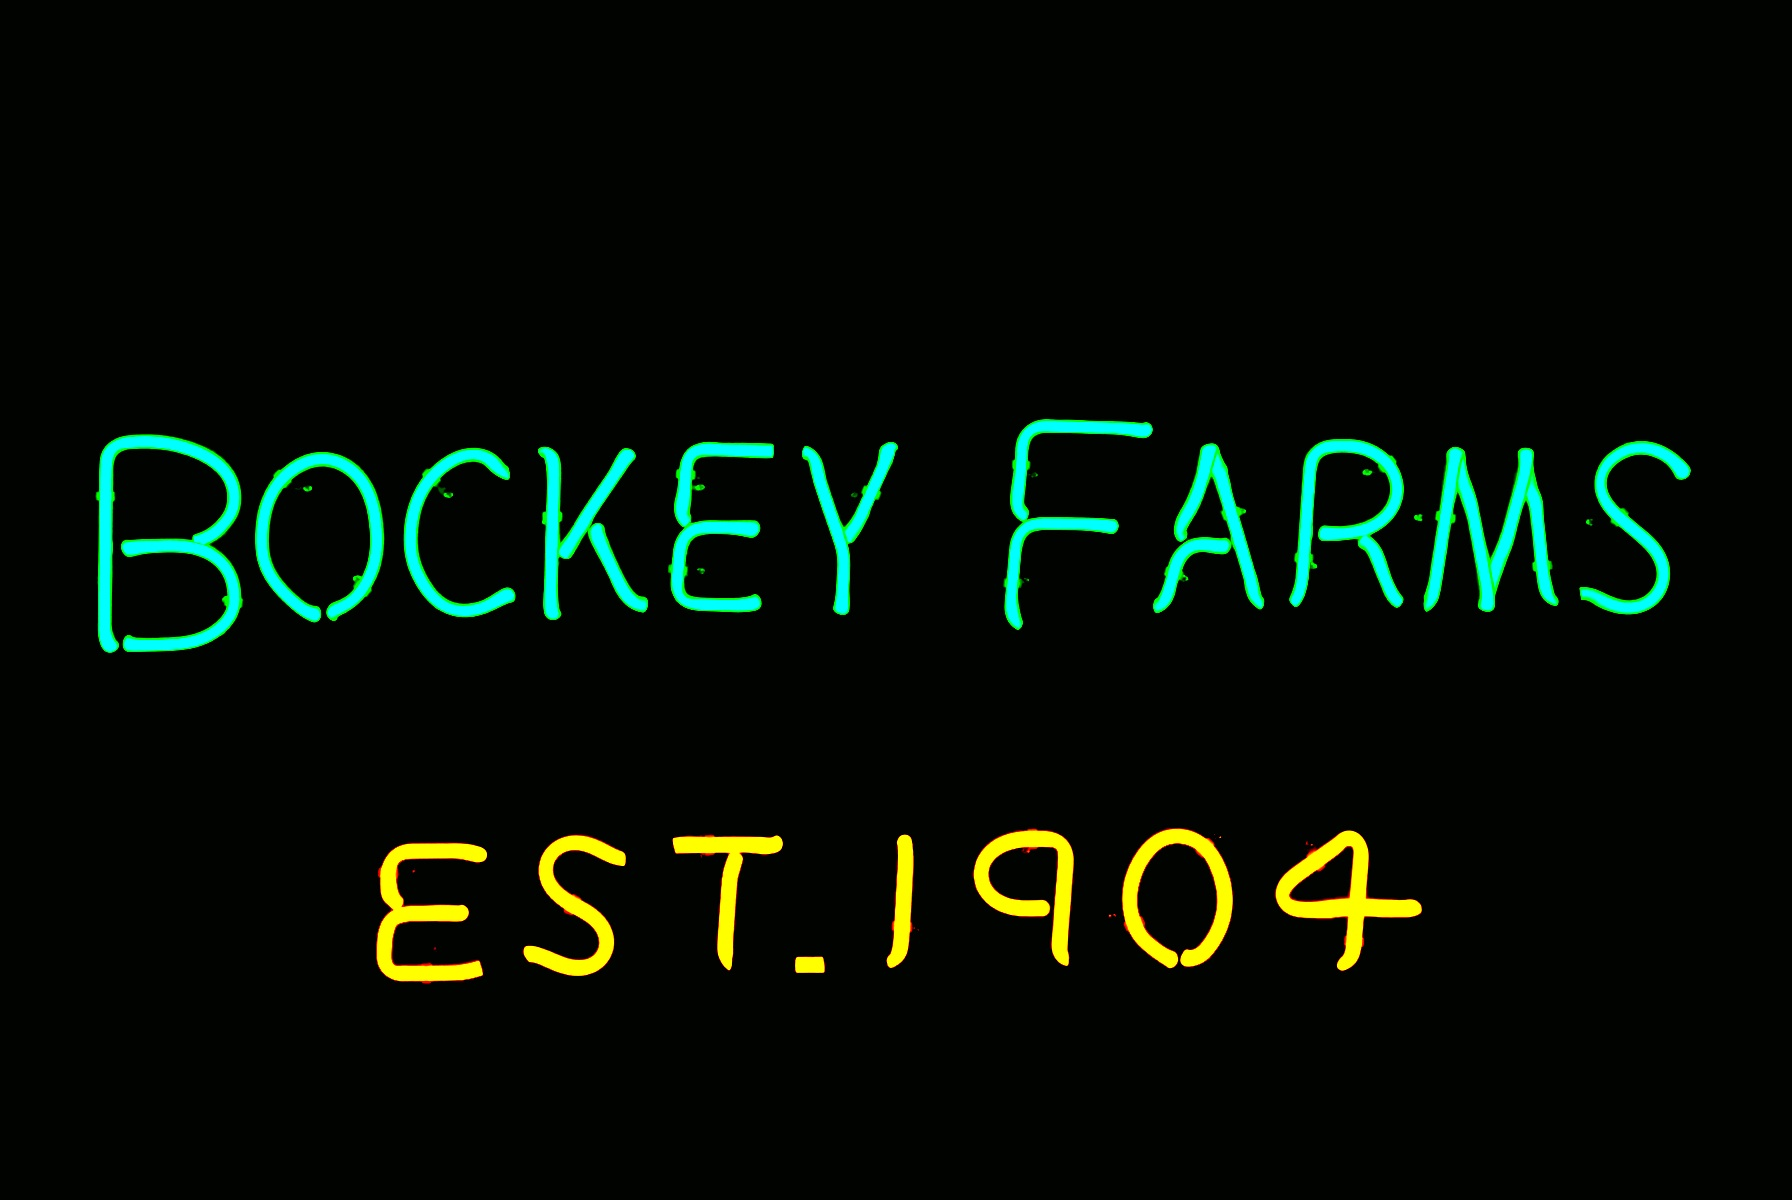 Bockey Farms - Commercial Neon Sign.jpg